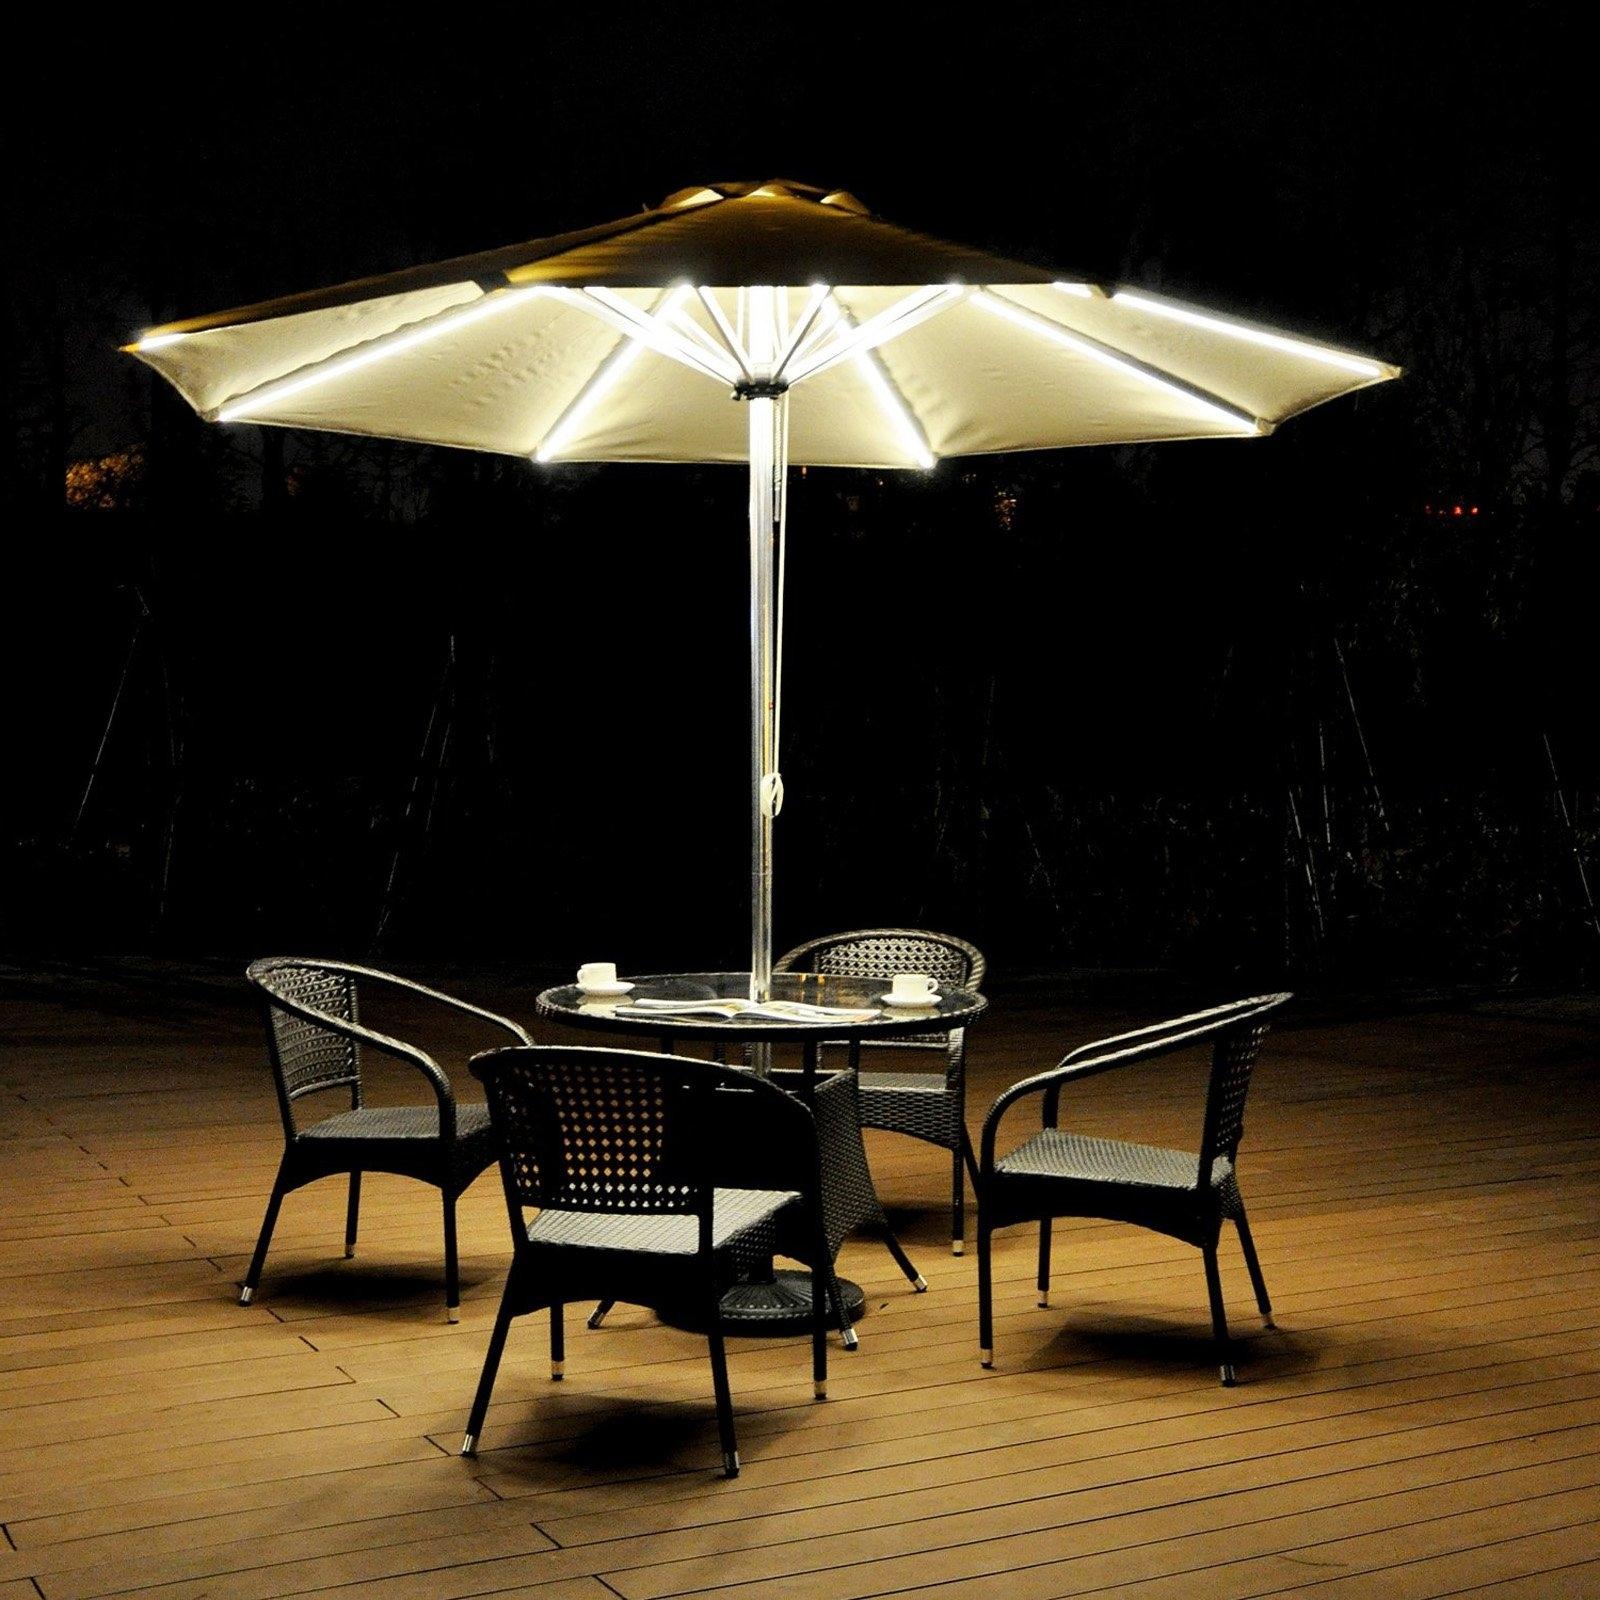 Outdoor Umbrella Lanterns Pertaining To Preferred Outdoor Umbrella With Lights – Outdoor Lighting Ideas (View 7 of 20)